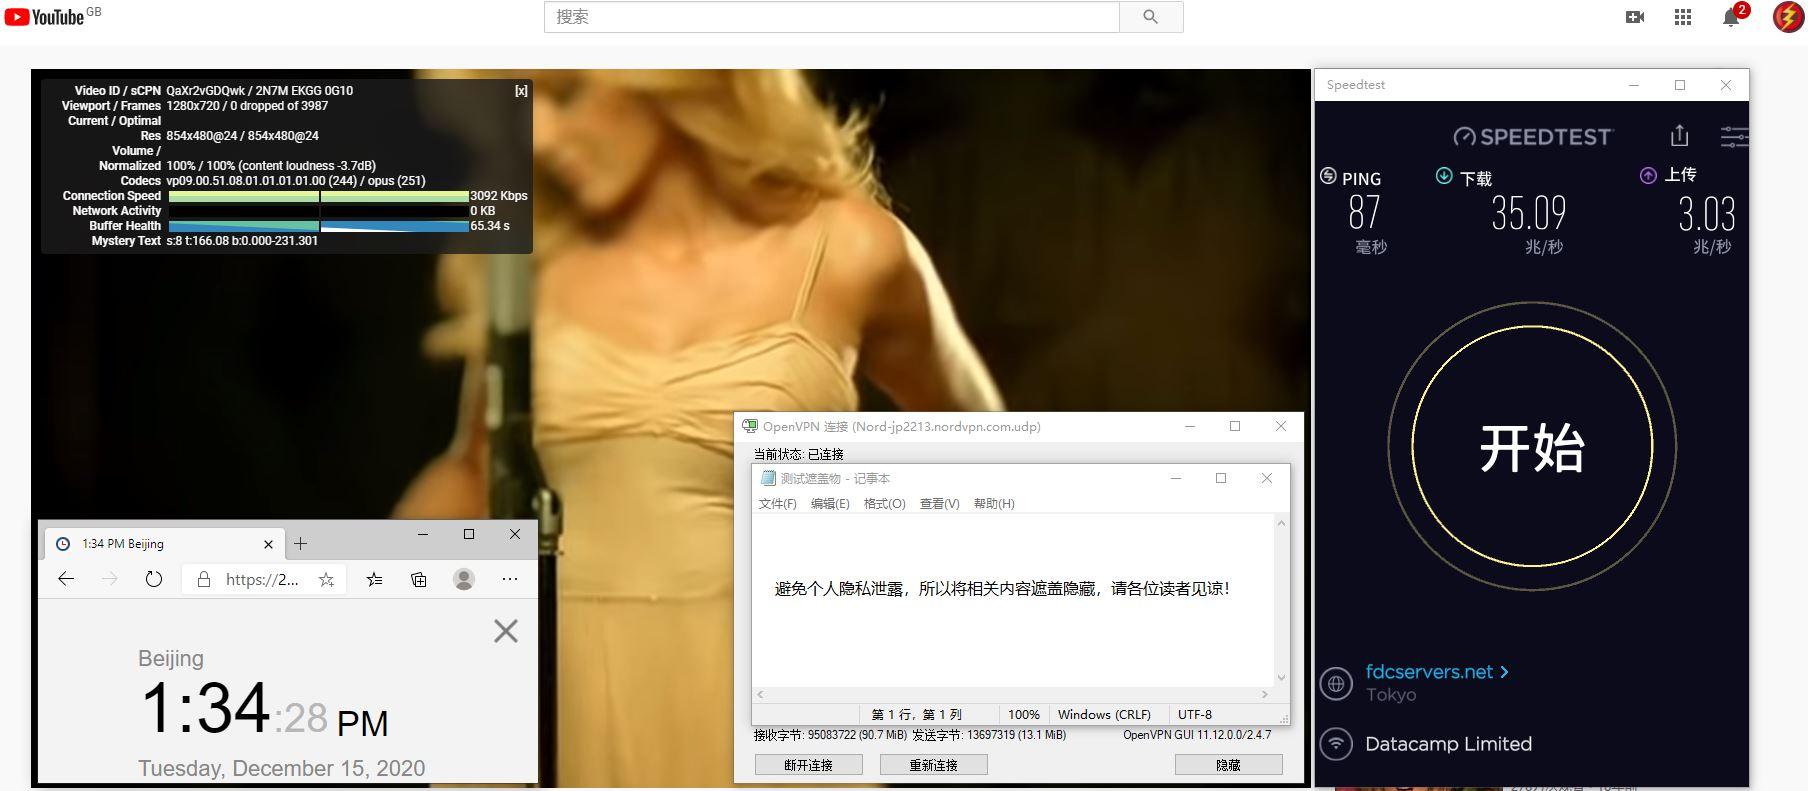 Windows10 NordVPN OpenVPN Gui JP2213 服务器 中国VPN 翻墙 科学上网 测试 - 20201215